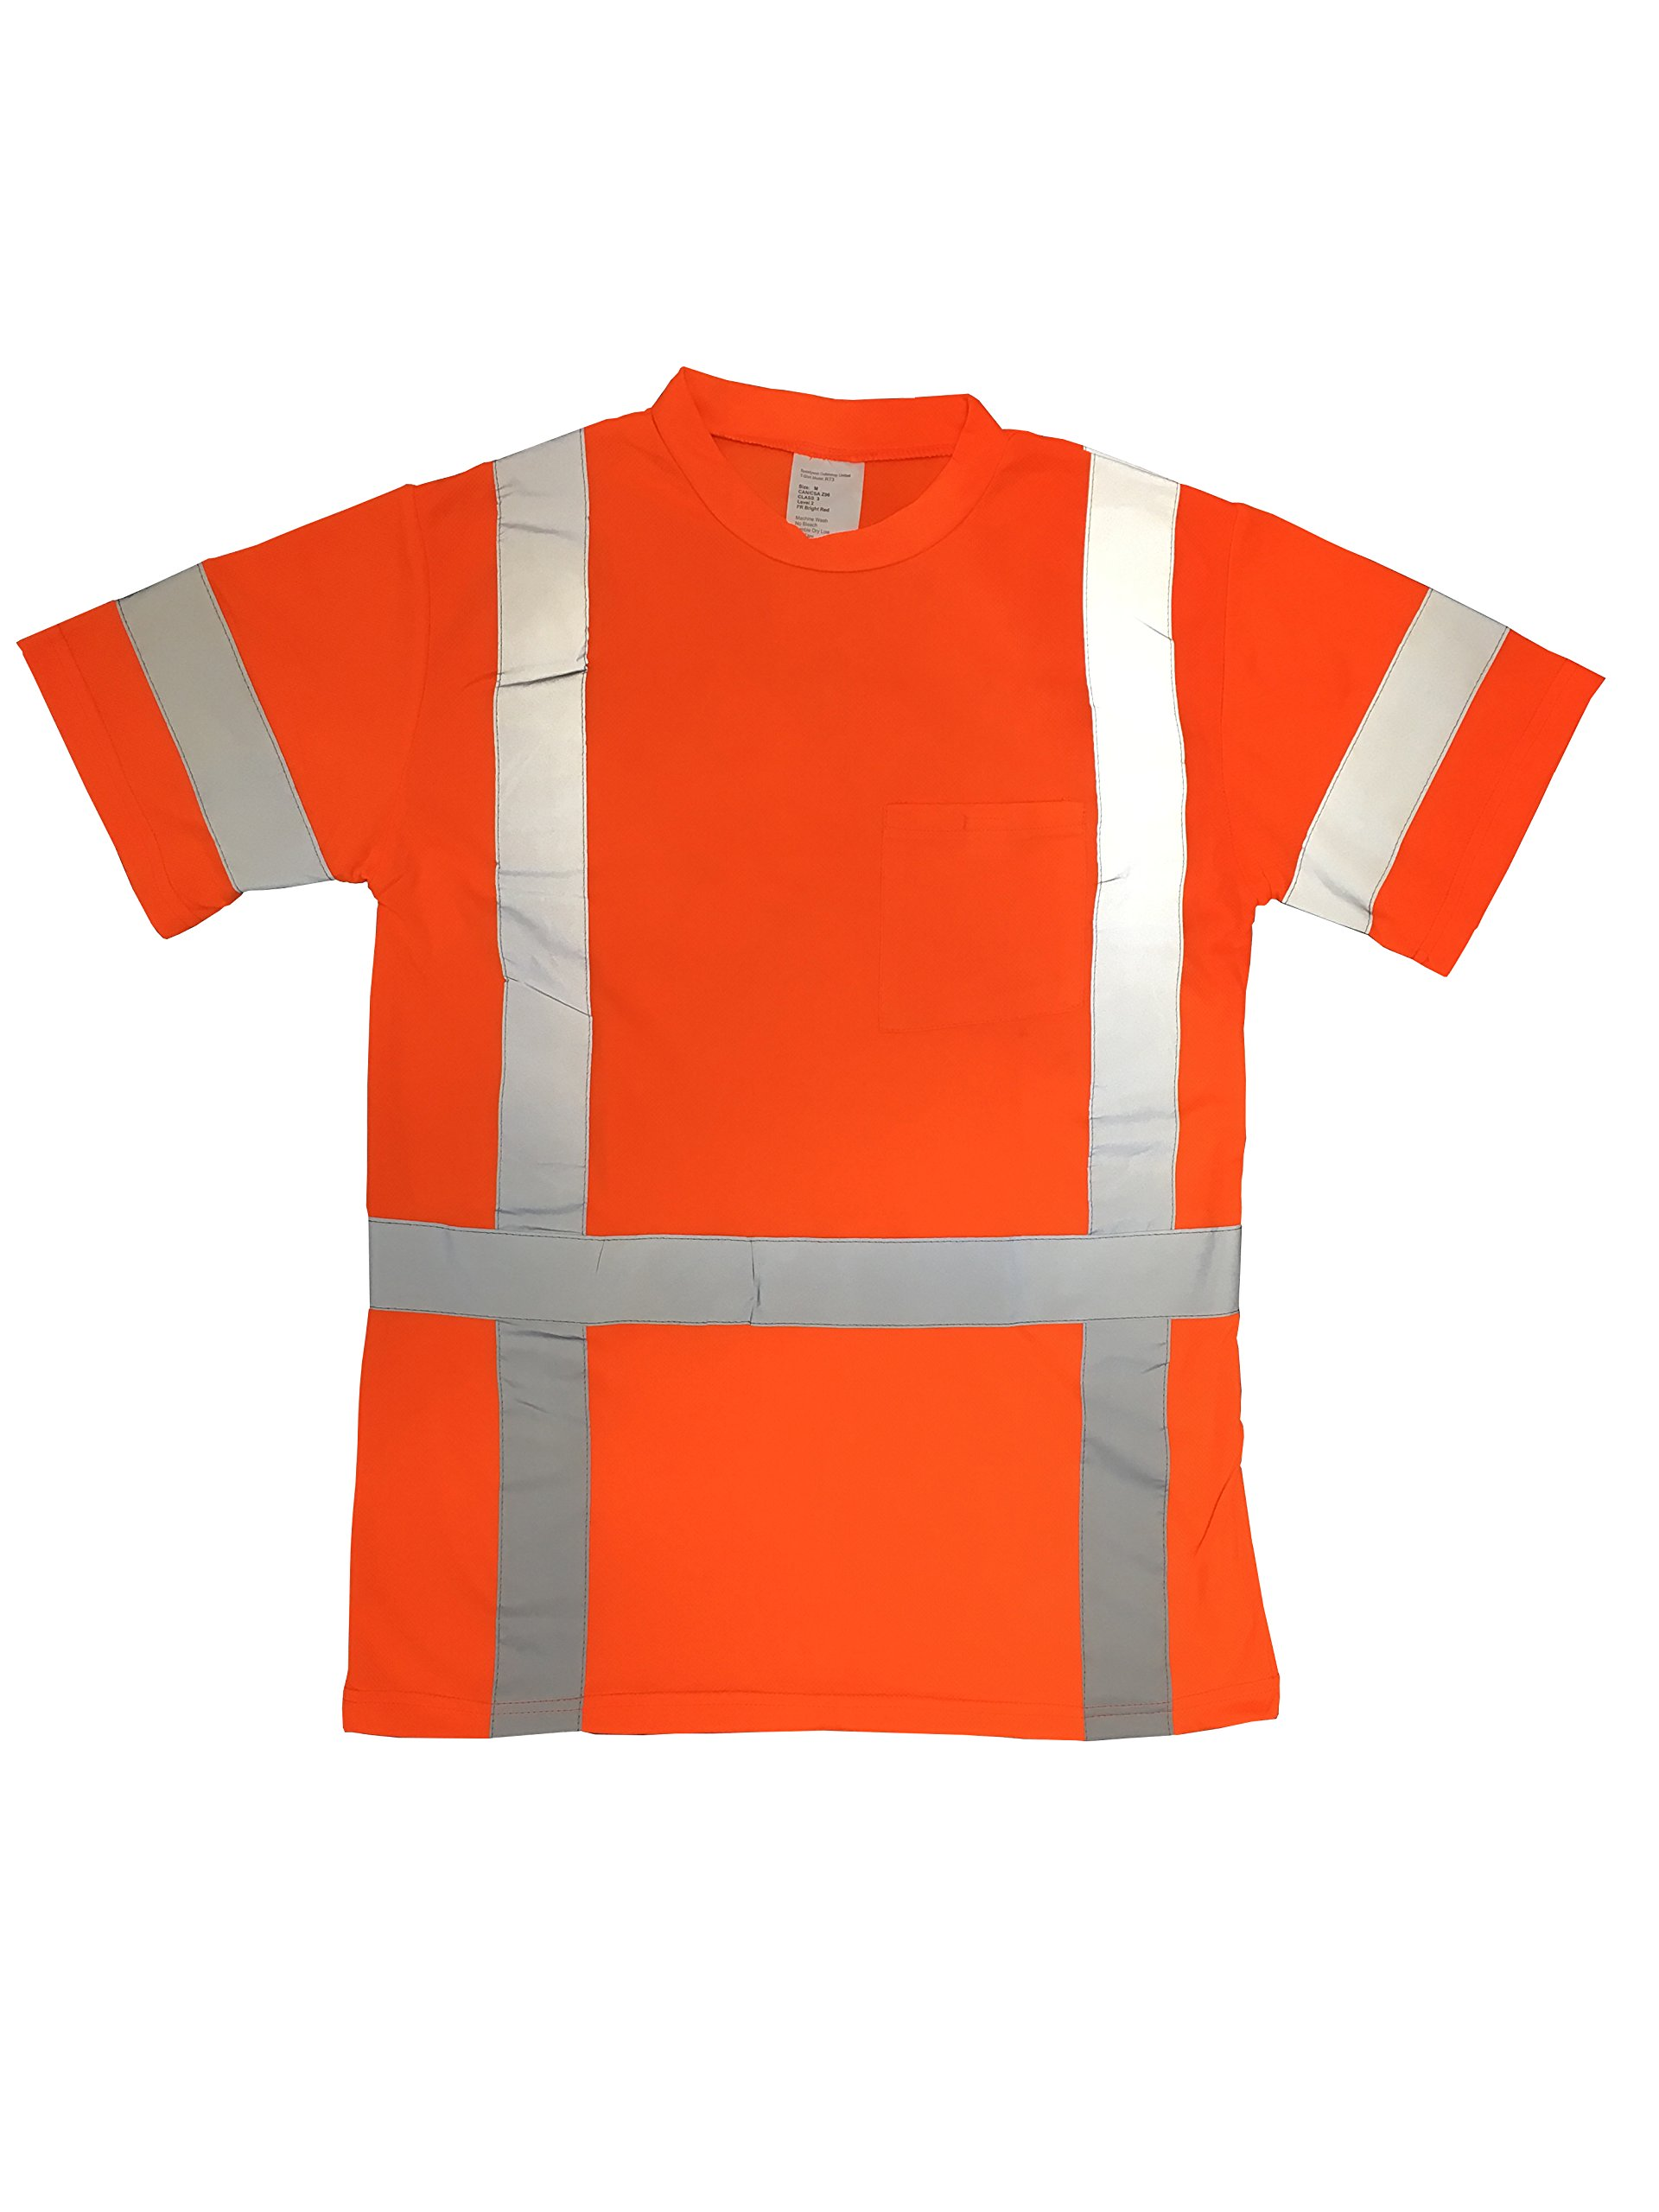 ANSI Class 3 High Visibility Reflective Safety T-Shirt … (Large, Orange)